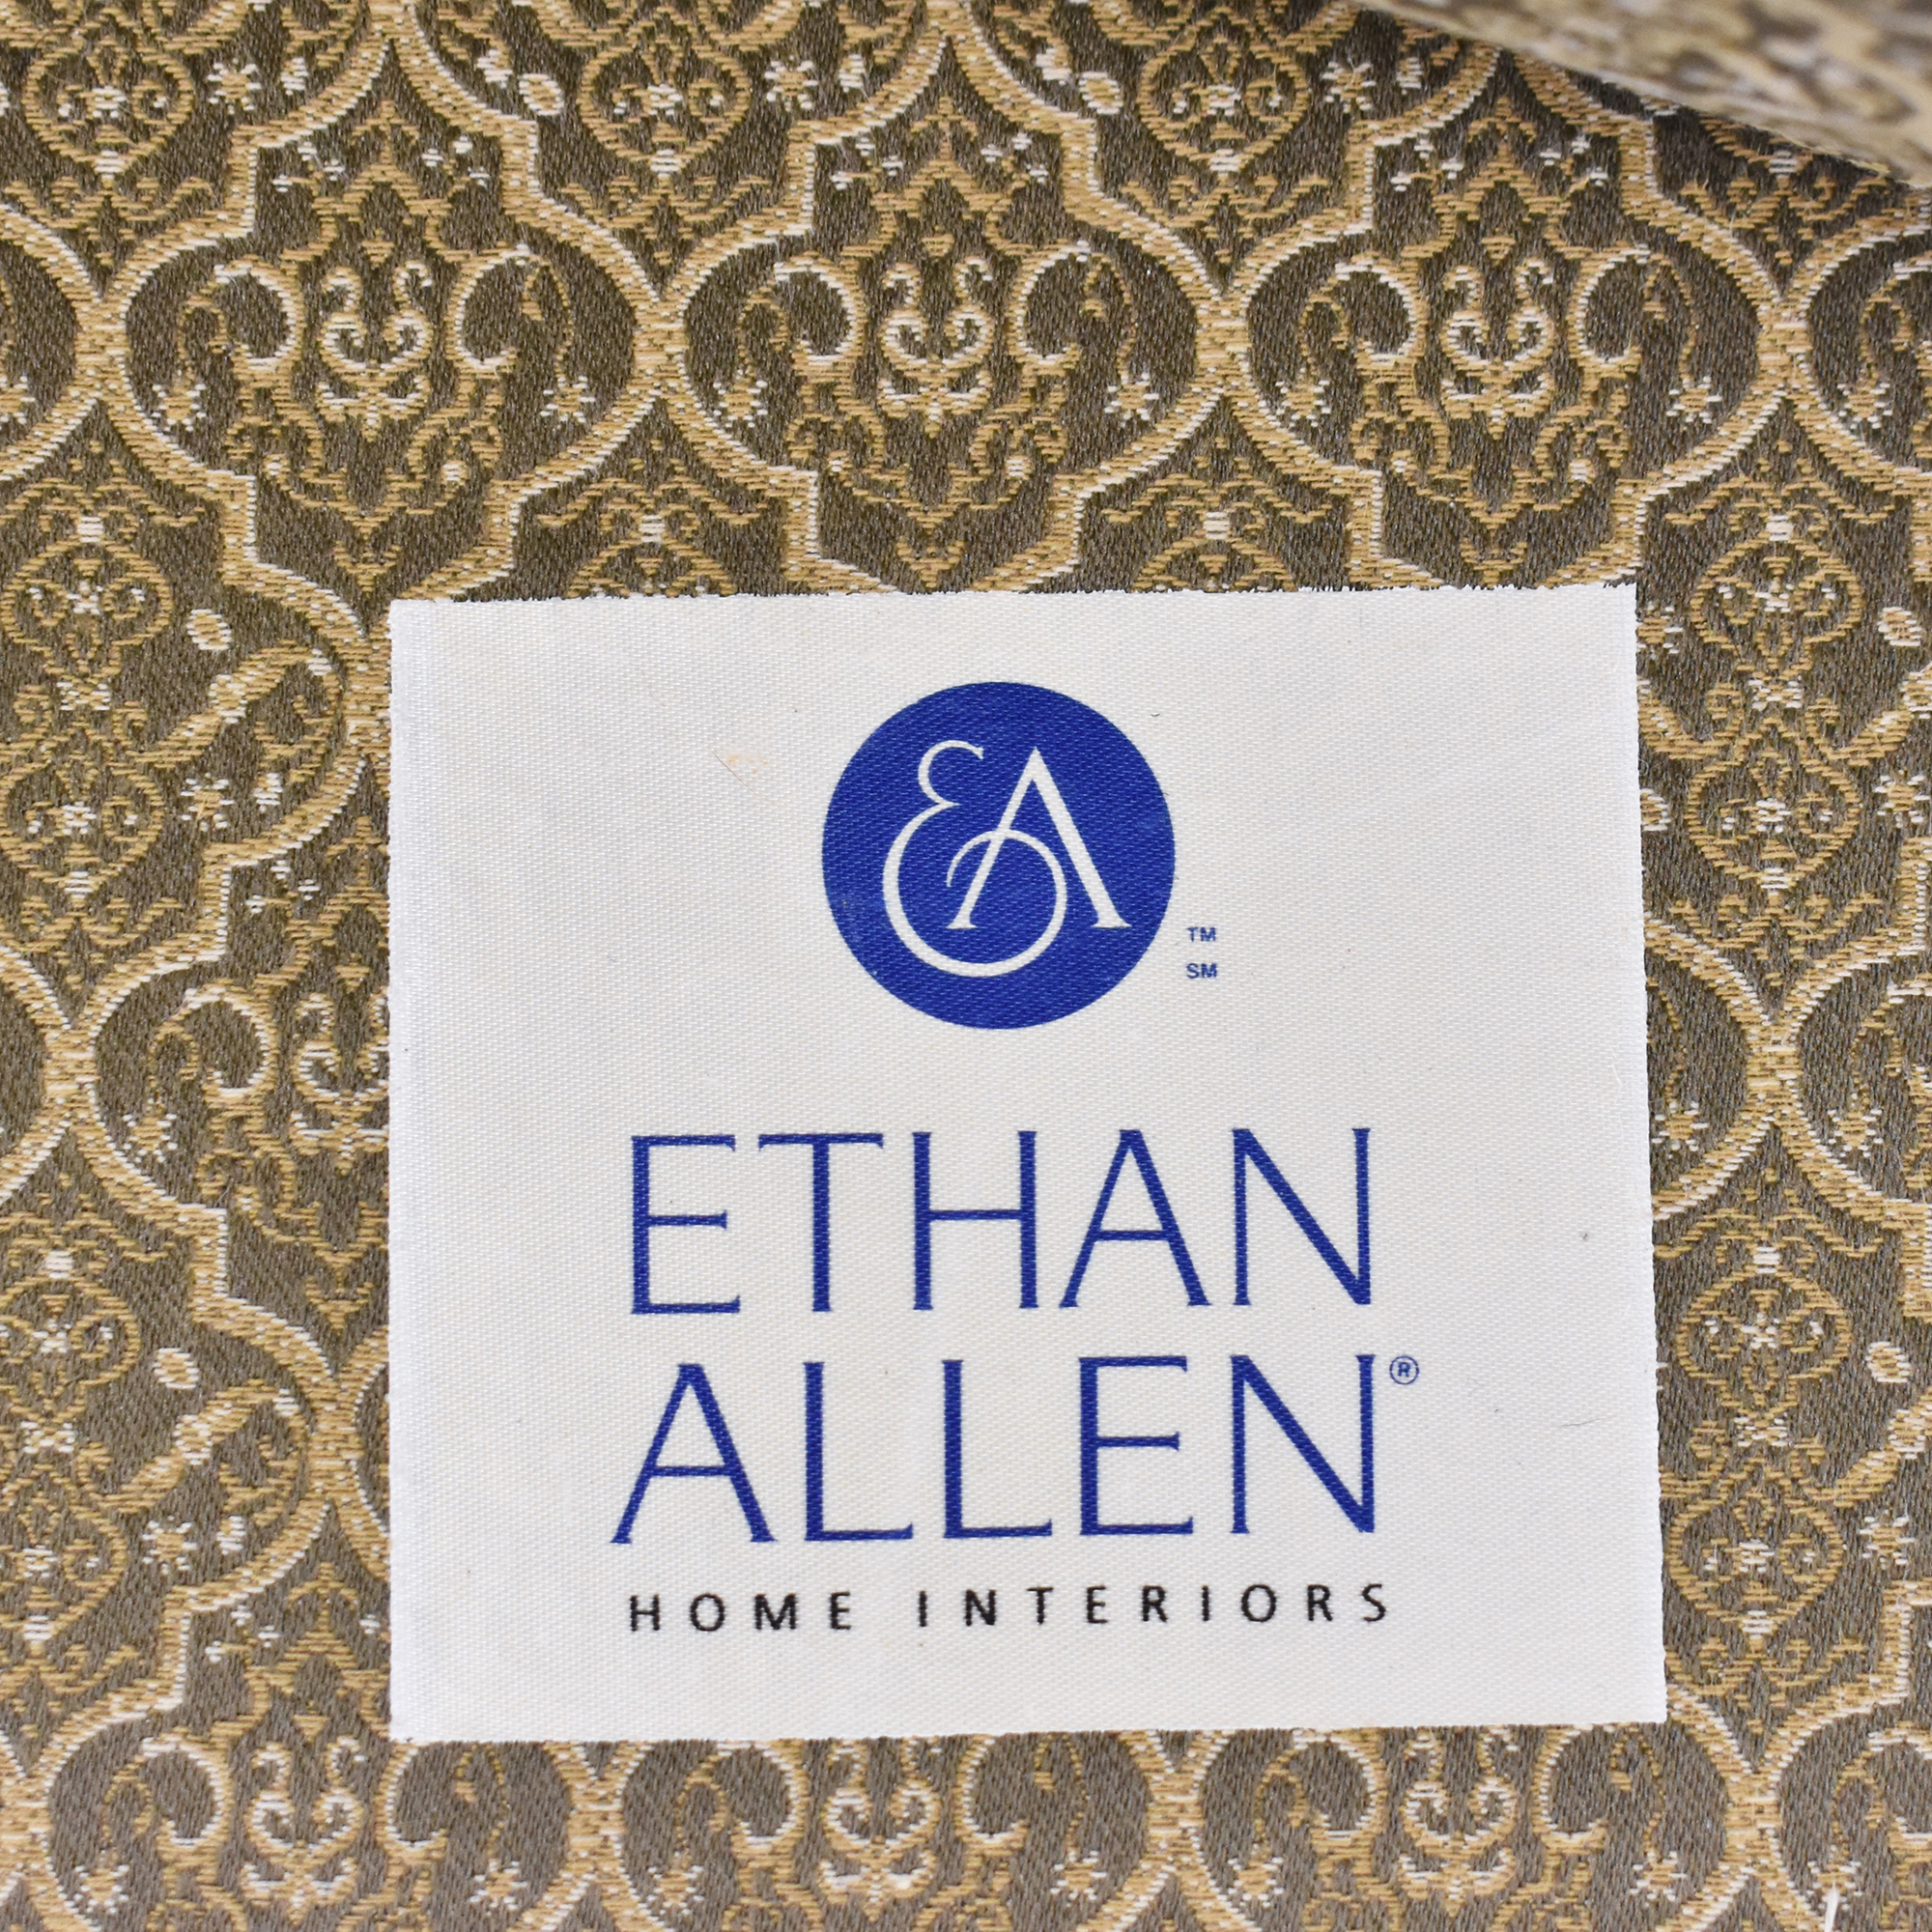 Ethan Allen Ethan Allen Queen Anne Wing Chair Accent Chairs